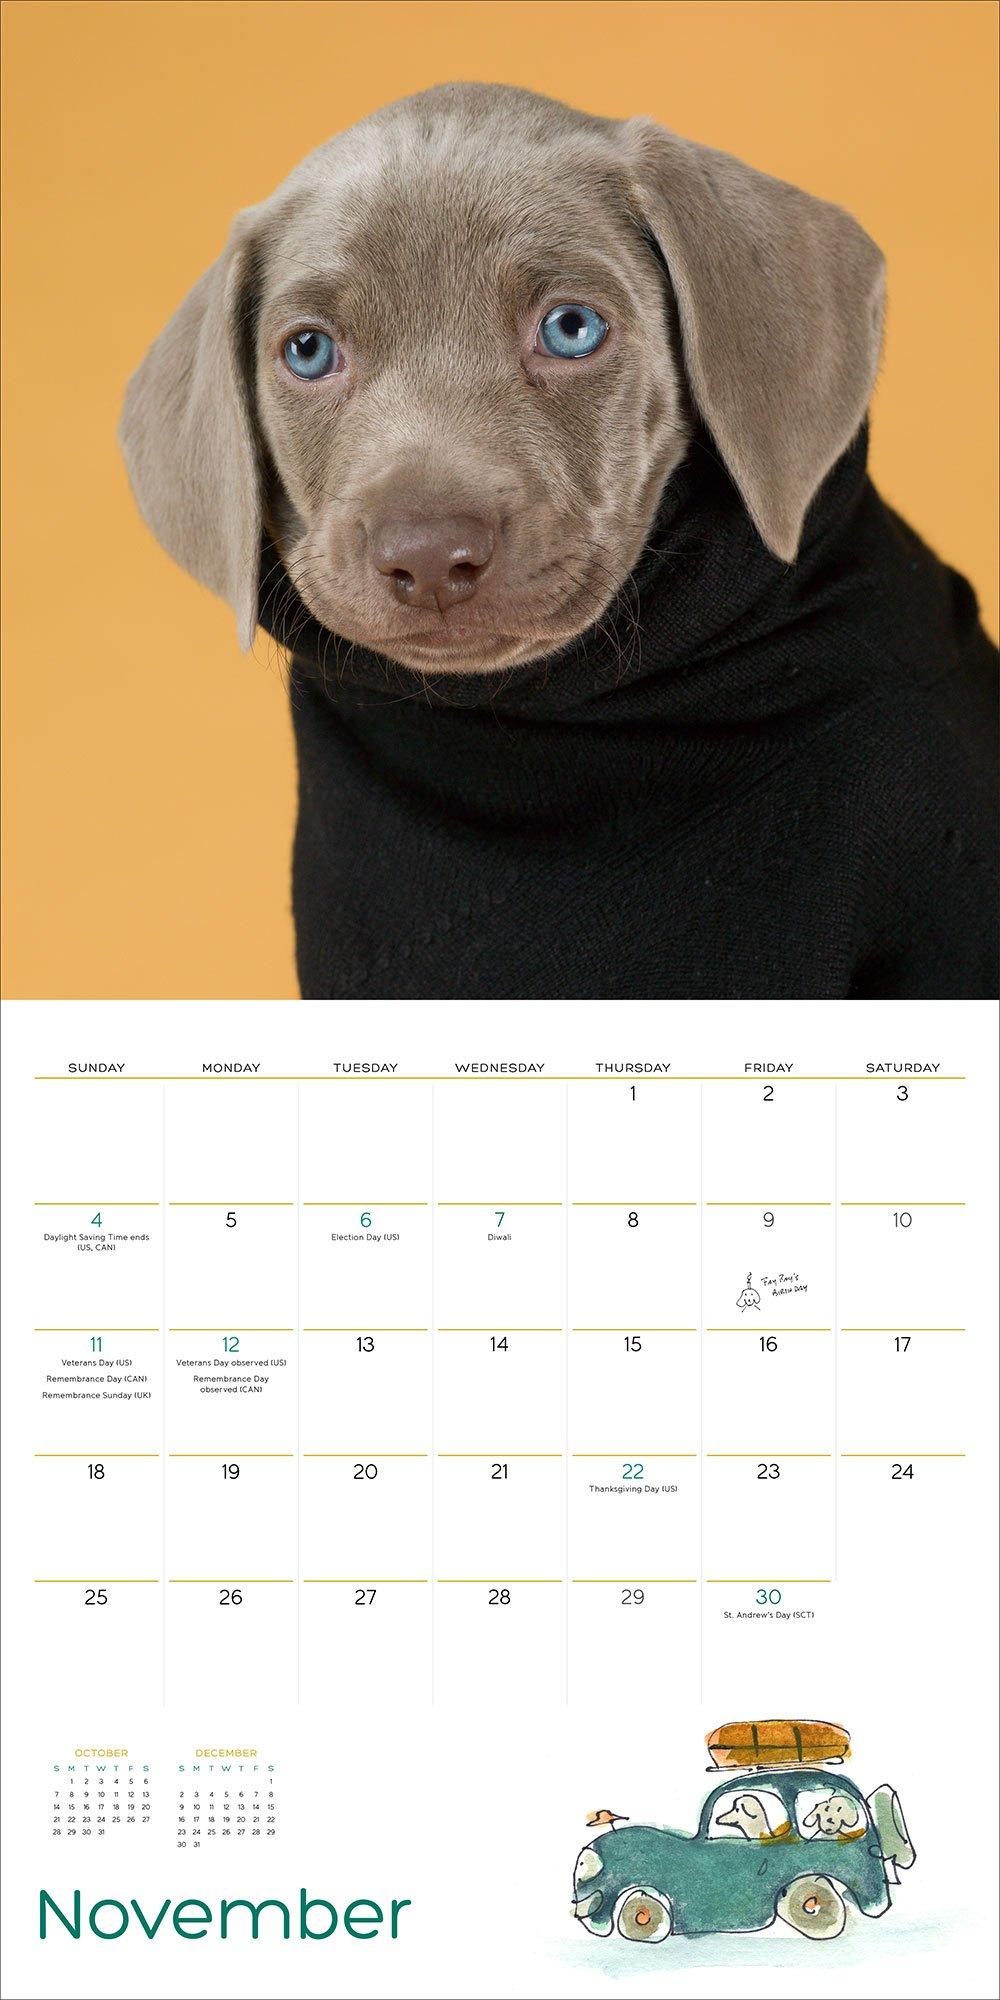 Amazon william wegman puppies 2018 wall calendar amazon william wegman puppies 2018 wall calendar 9781419724770 william wegman books nvjuhfo Image collections